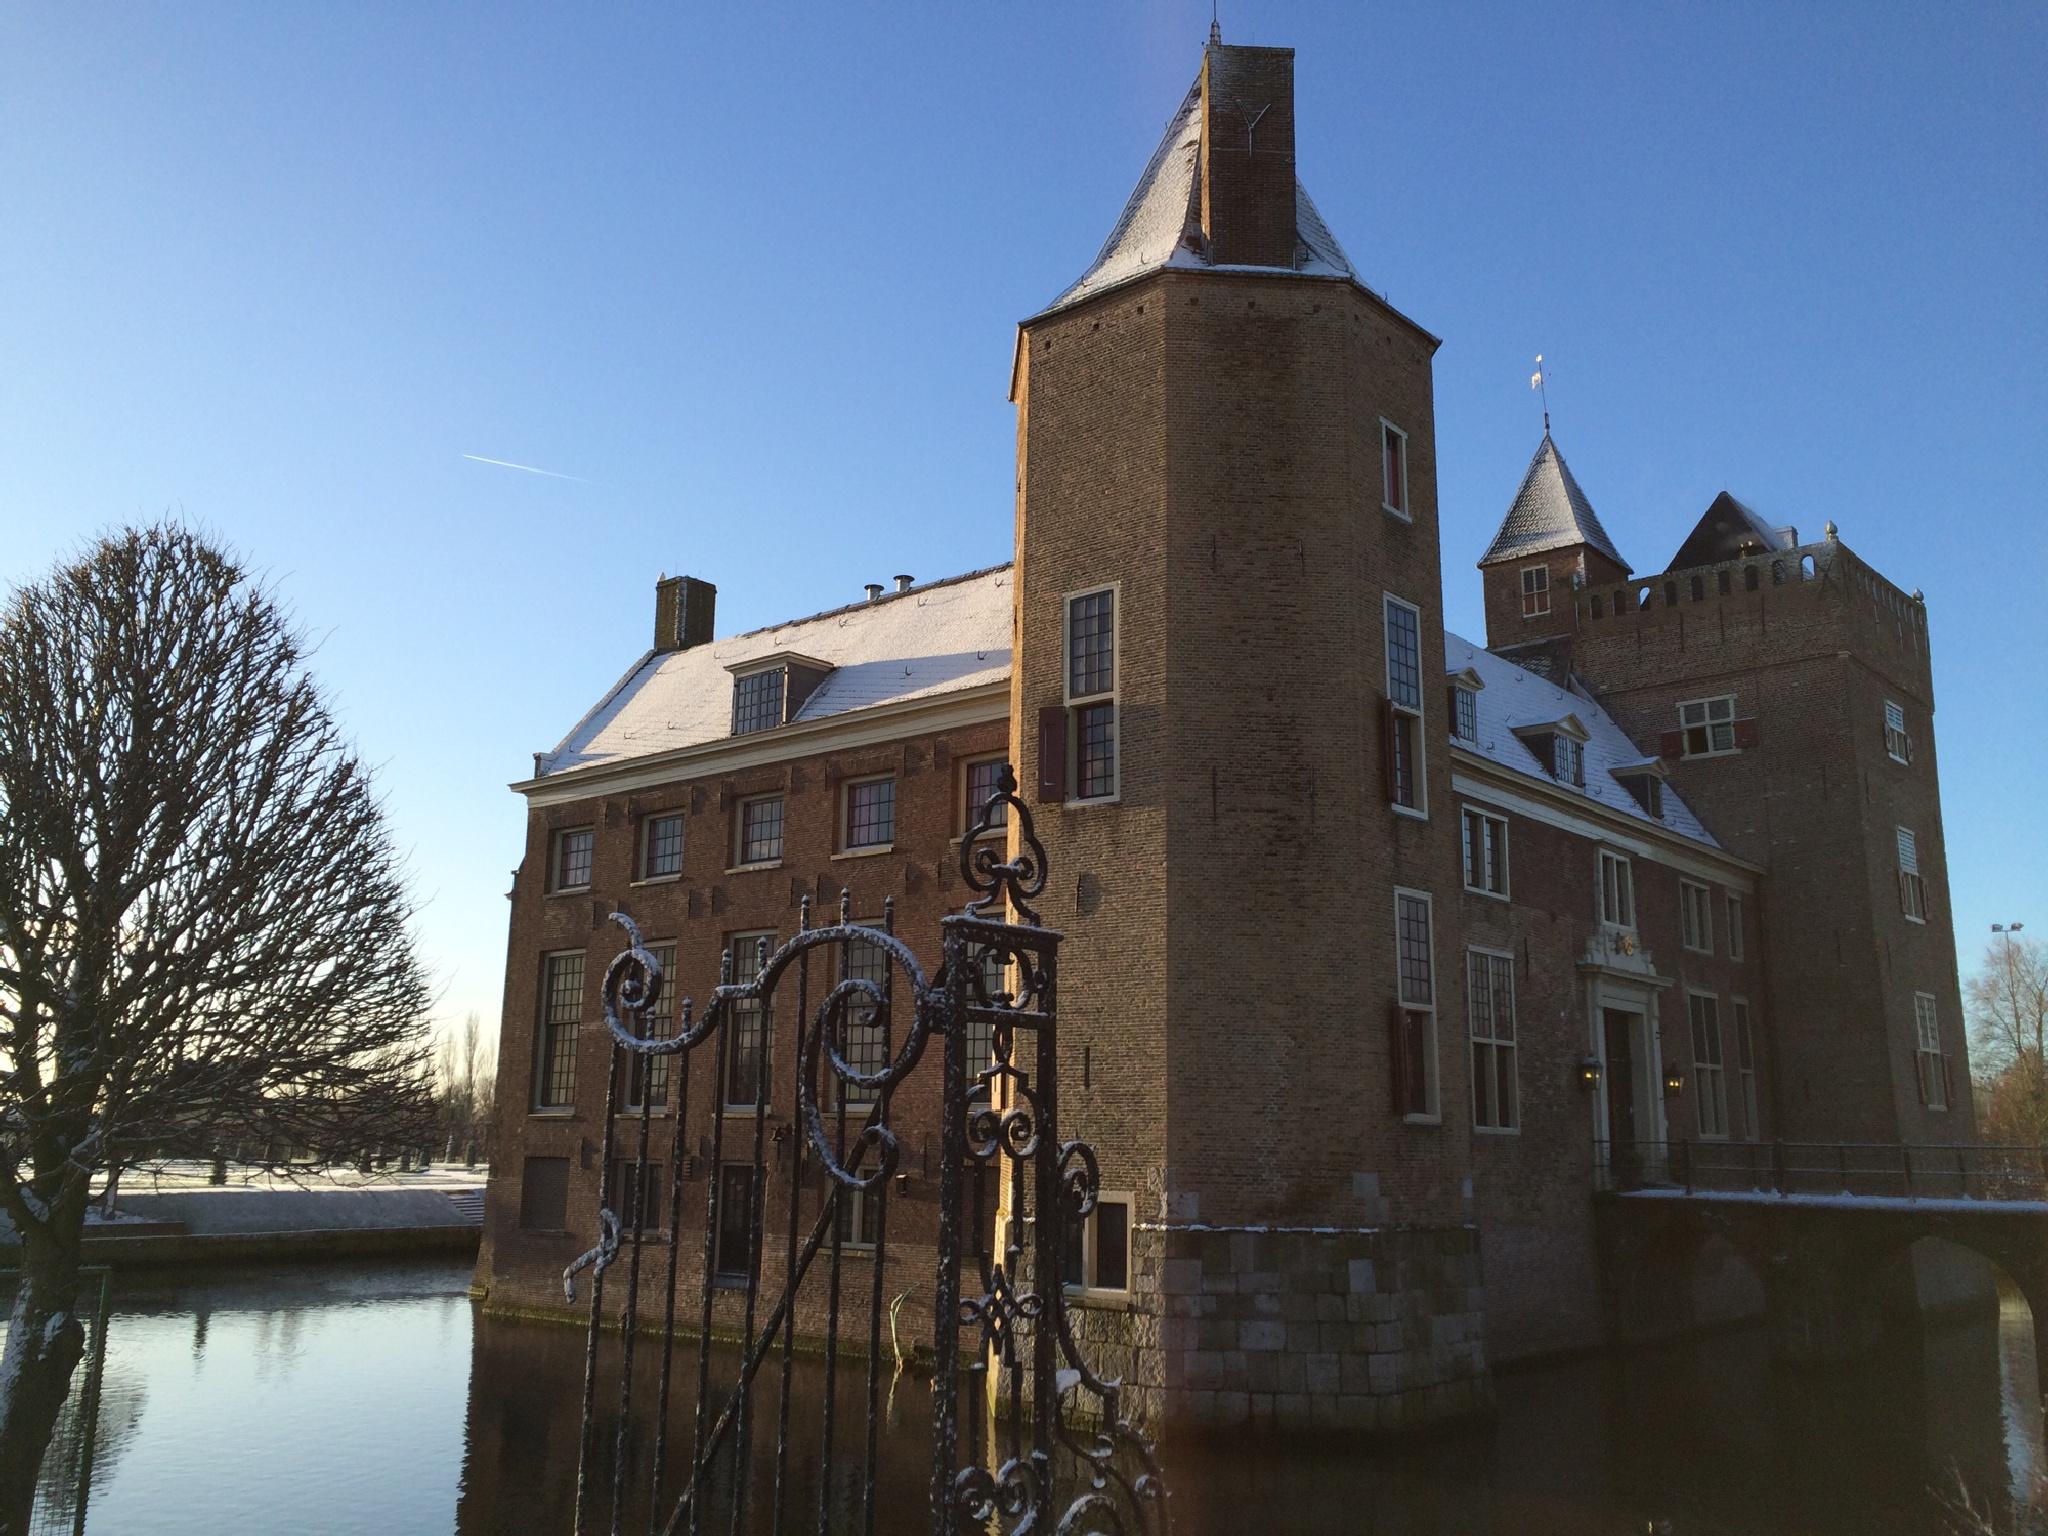 Beverwijk, Netherlands, sunday morning by patrick vischschraper